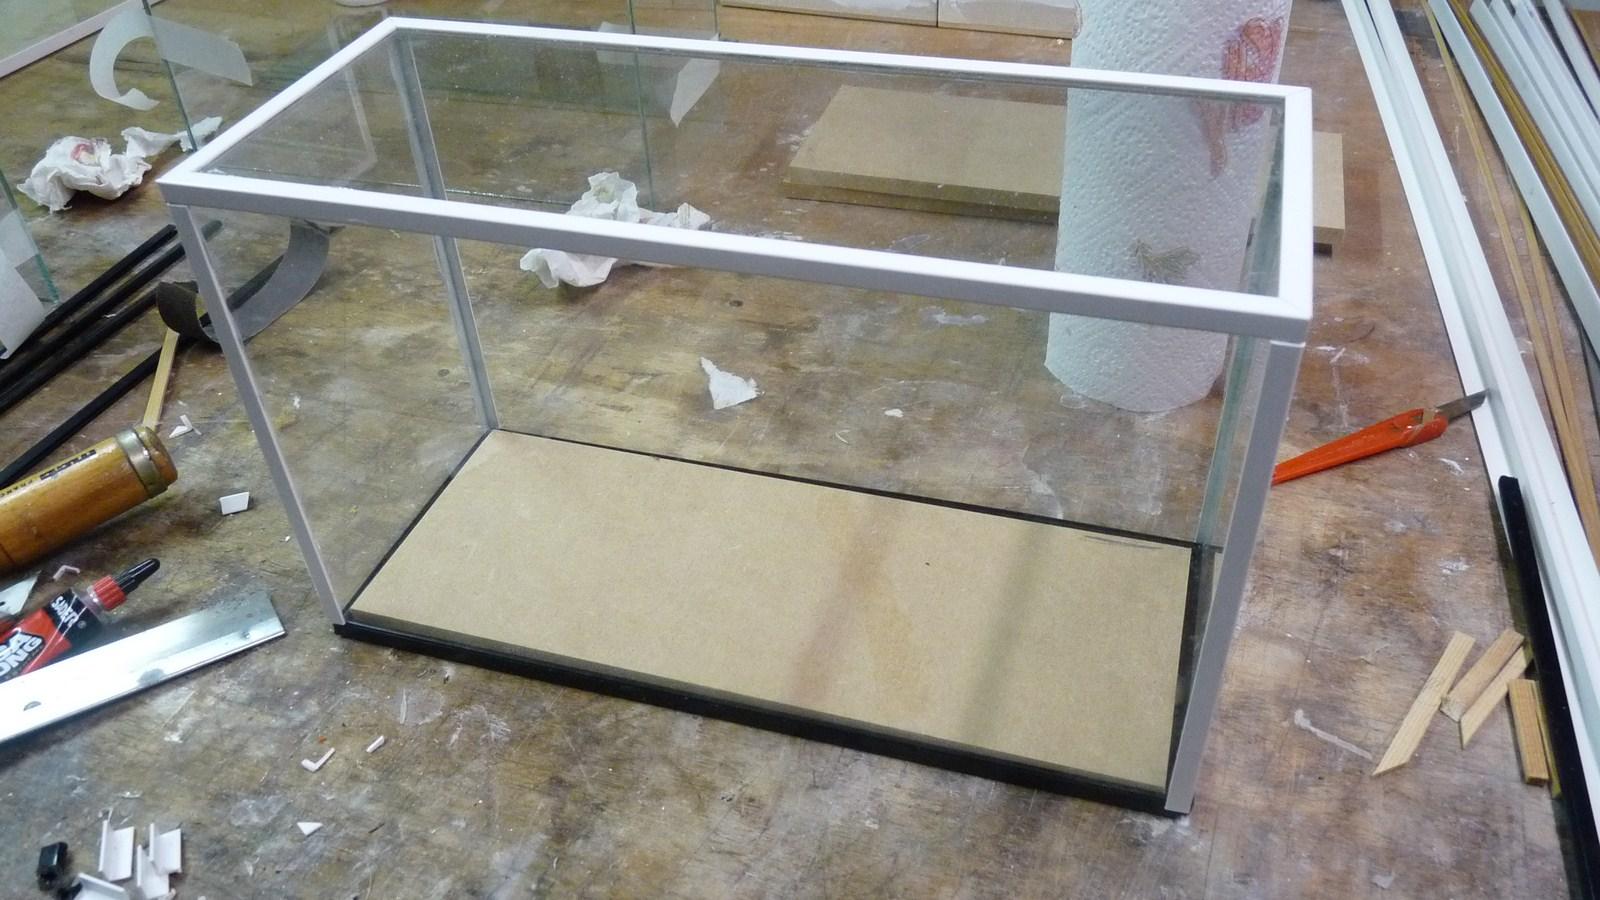 Fabriquer ses propres vitrines en verre 17071907270323134915156556